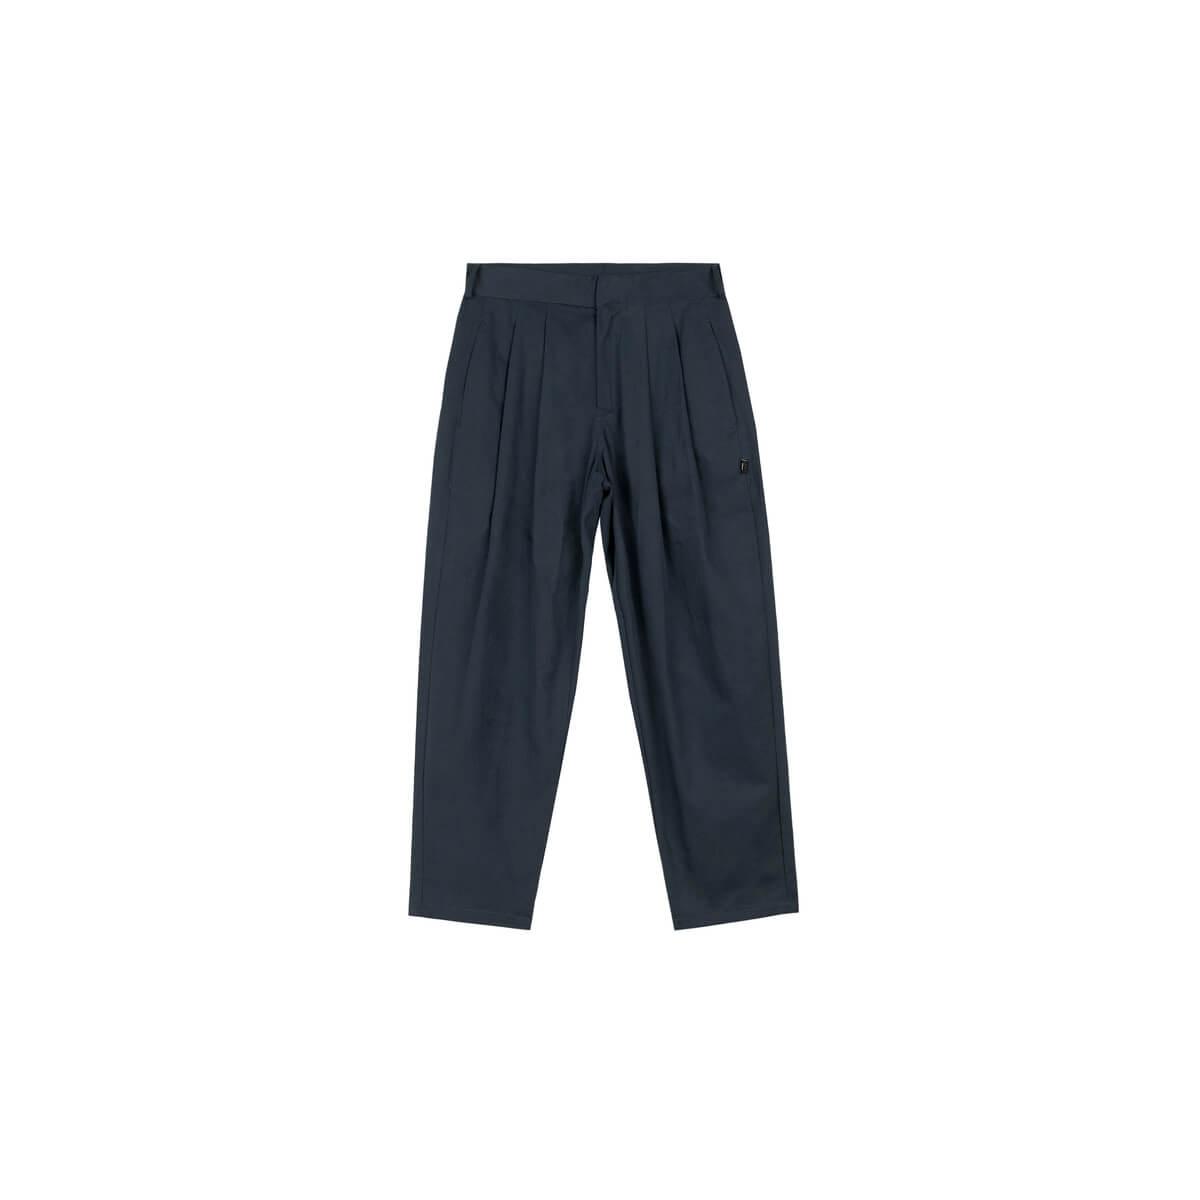 Брюки DL Studio Casual Fabric Pants Dark Blue